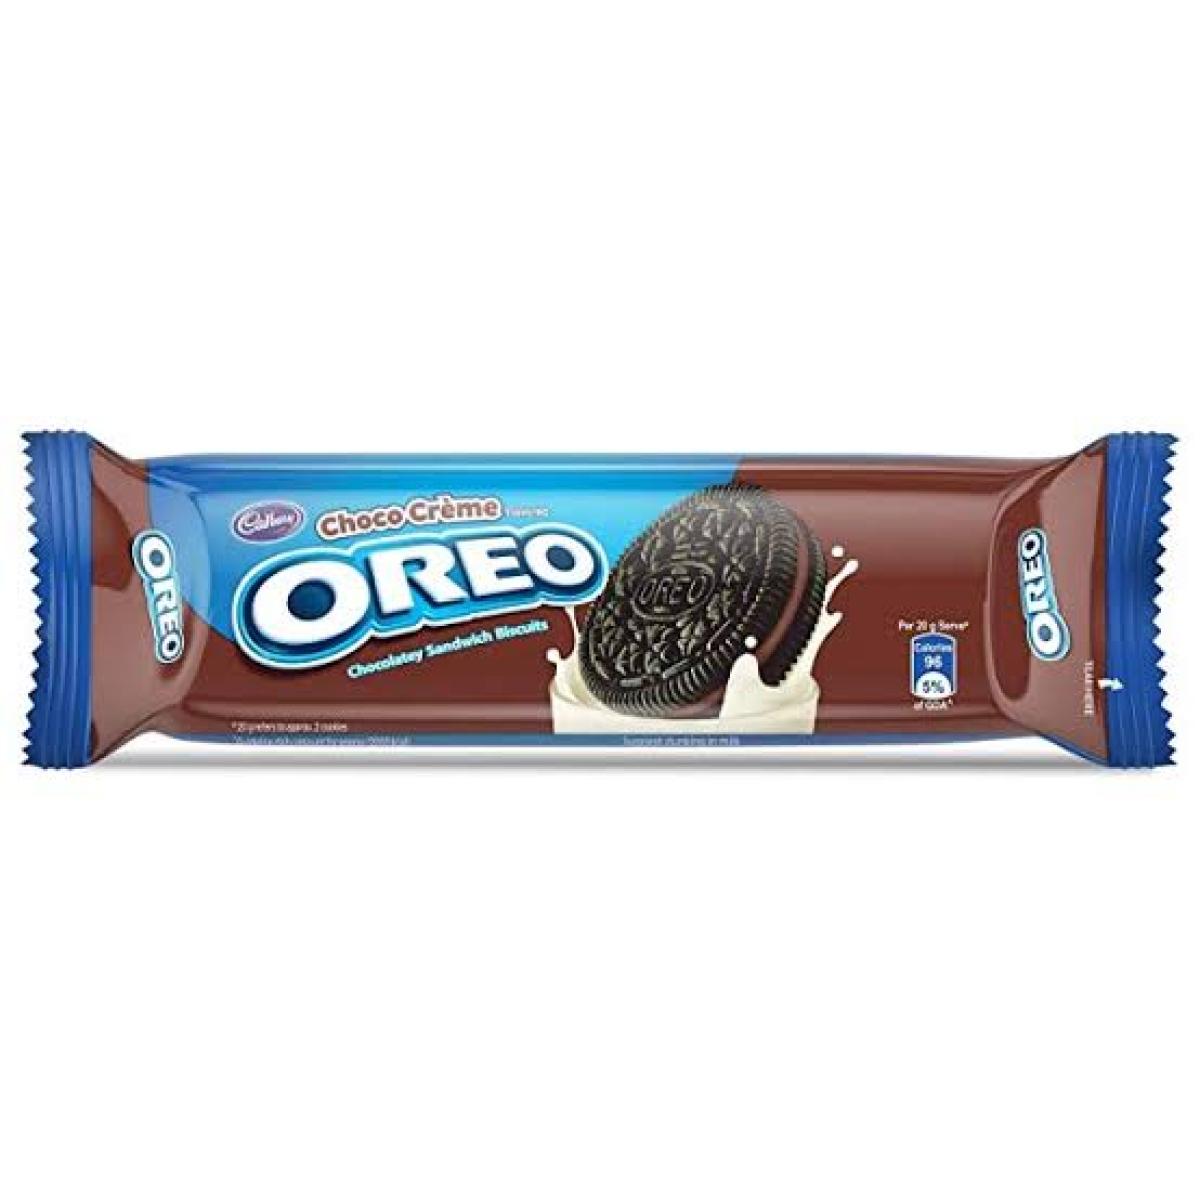 Oreo Choco Crème